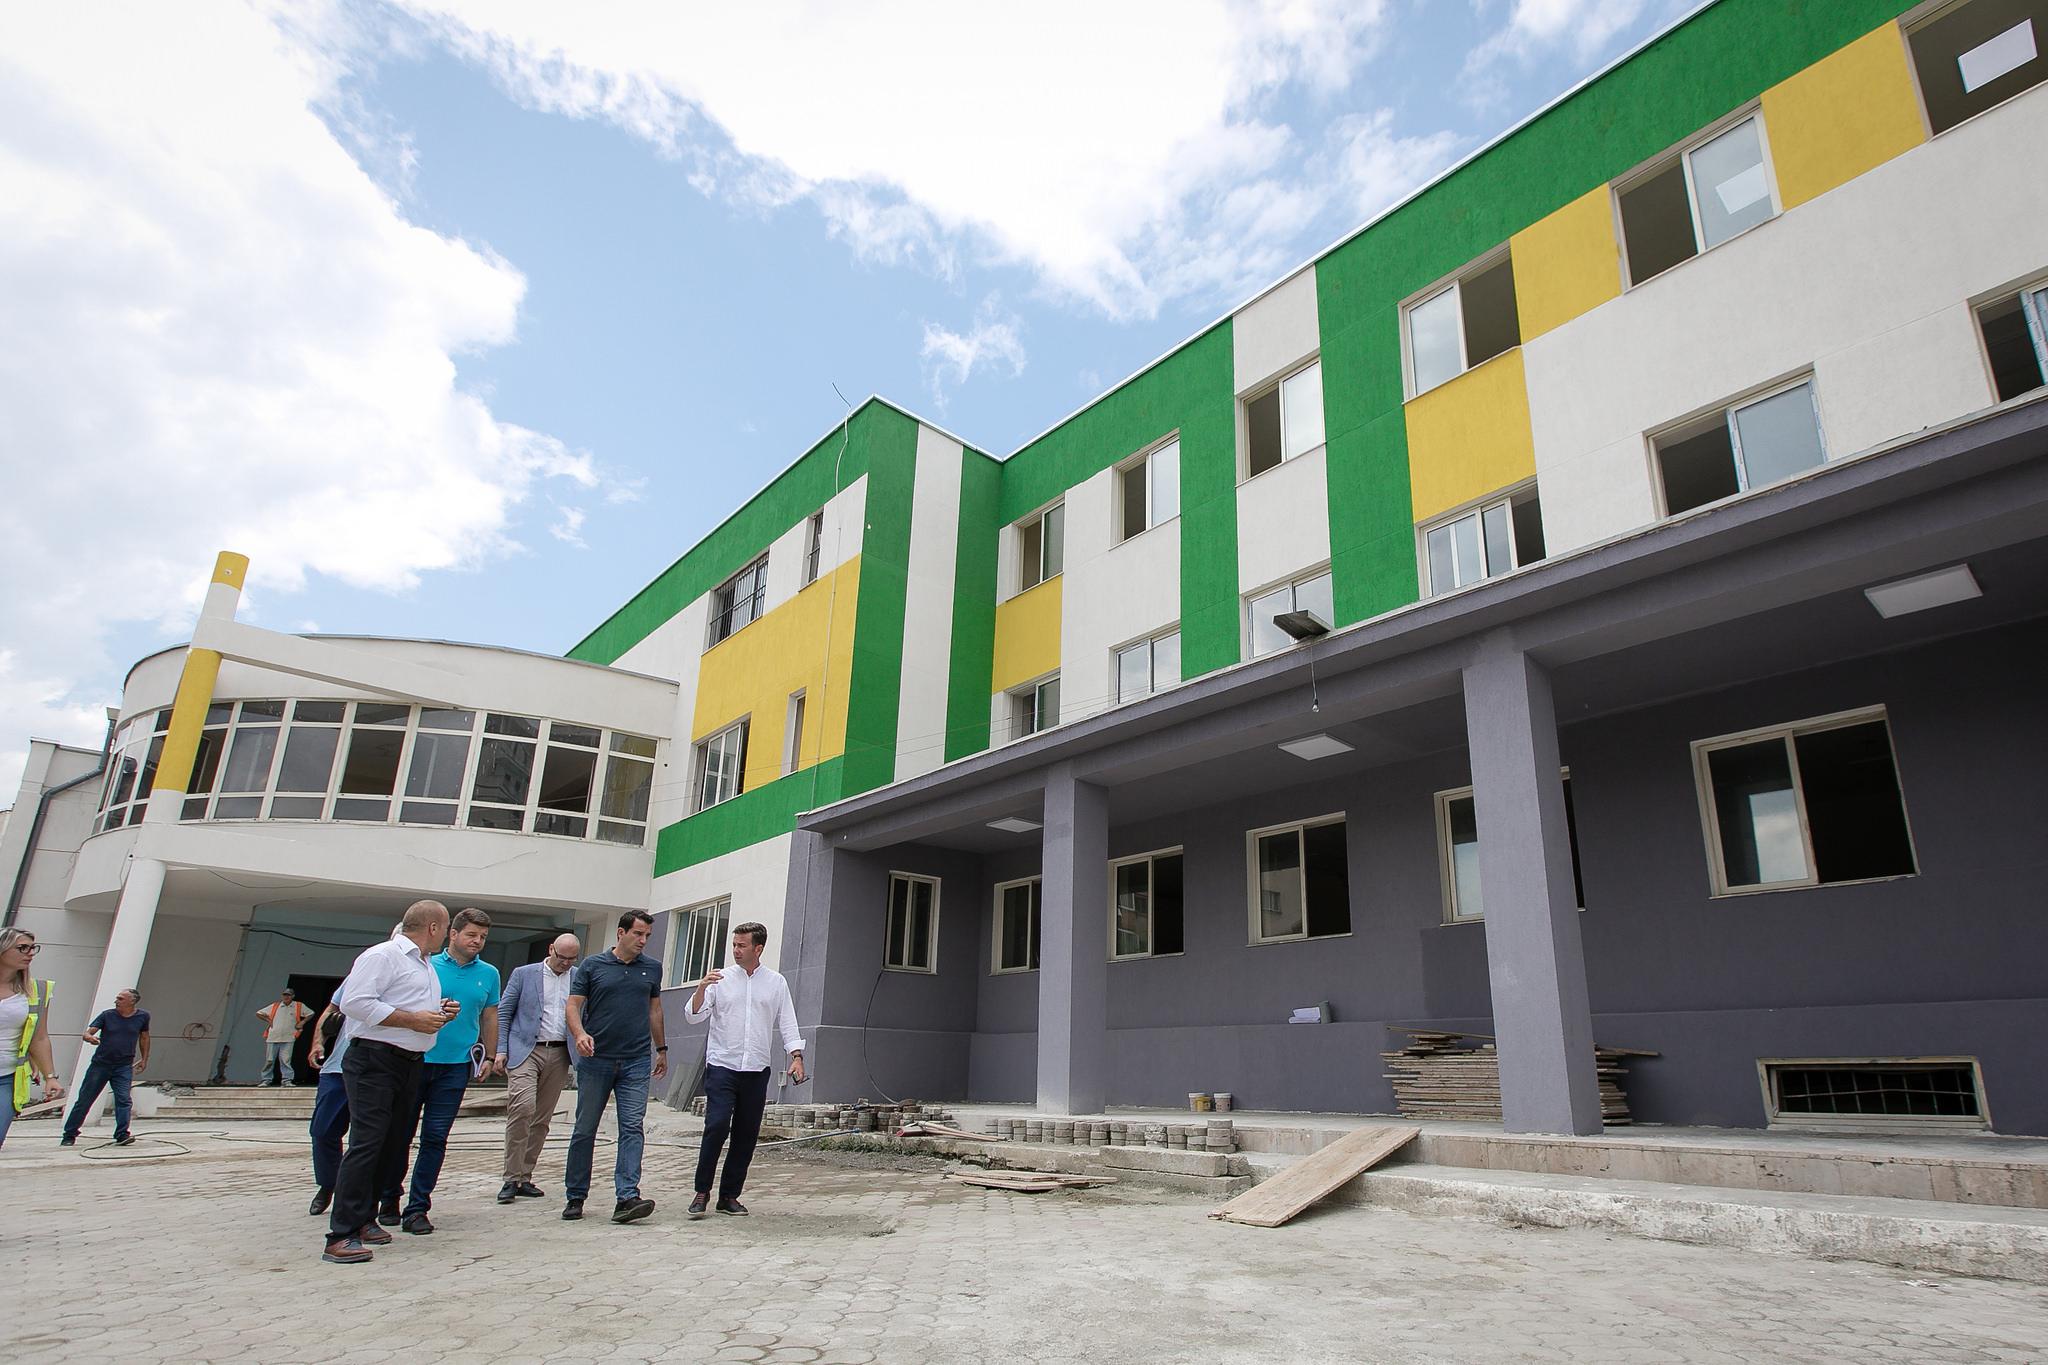 Veliaj gjate inspektimit te rikonstruksionit te shkolles Ismail Qemali (1)